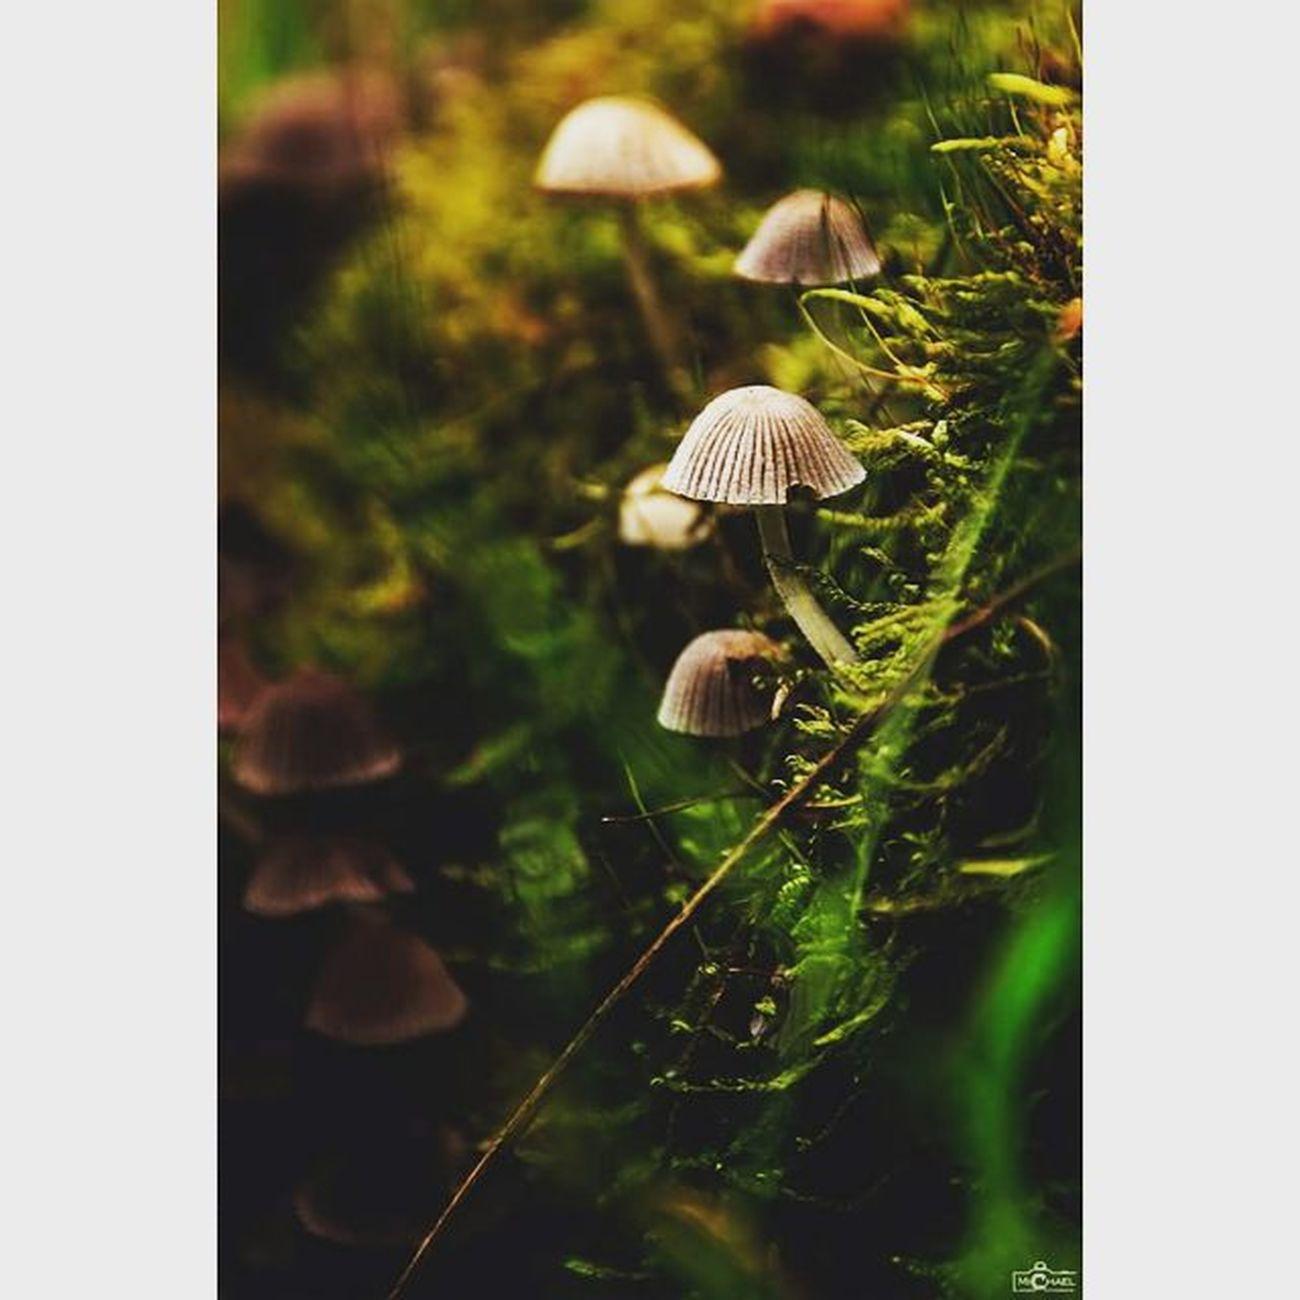 the mushrooms. Mushrooms CripixtMovement Calvinize Jaworskyj Michaellangerfotografie Makrophotography Makros Earthshoot Fotografie Photography Photographyislife